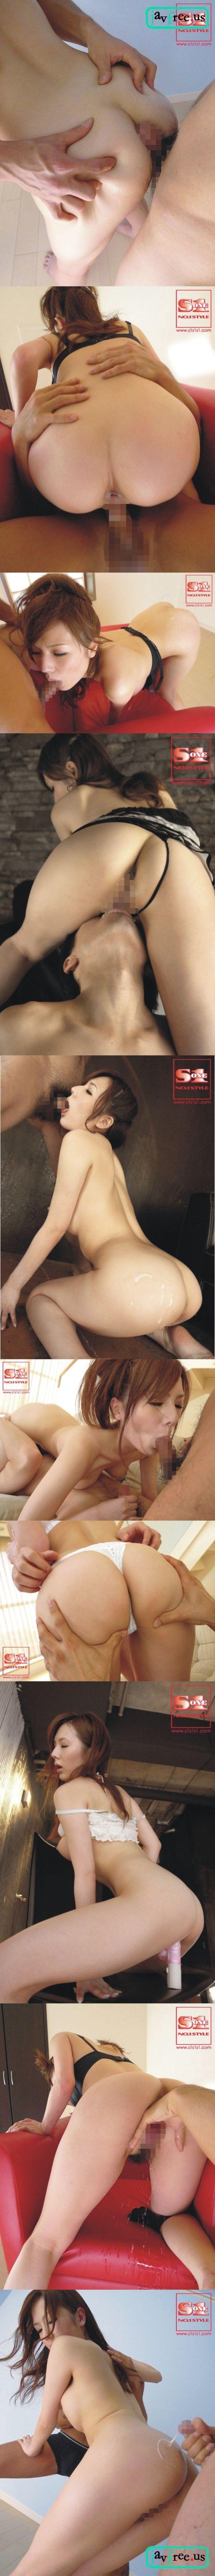 [SOE 520] 受精する美尻 梓ユイ 梓ユイ SOE